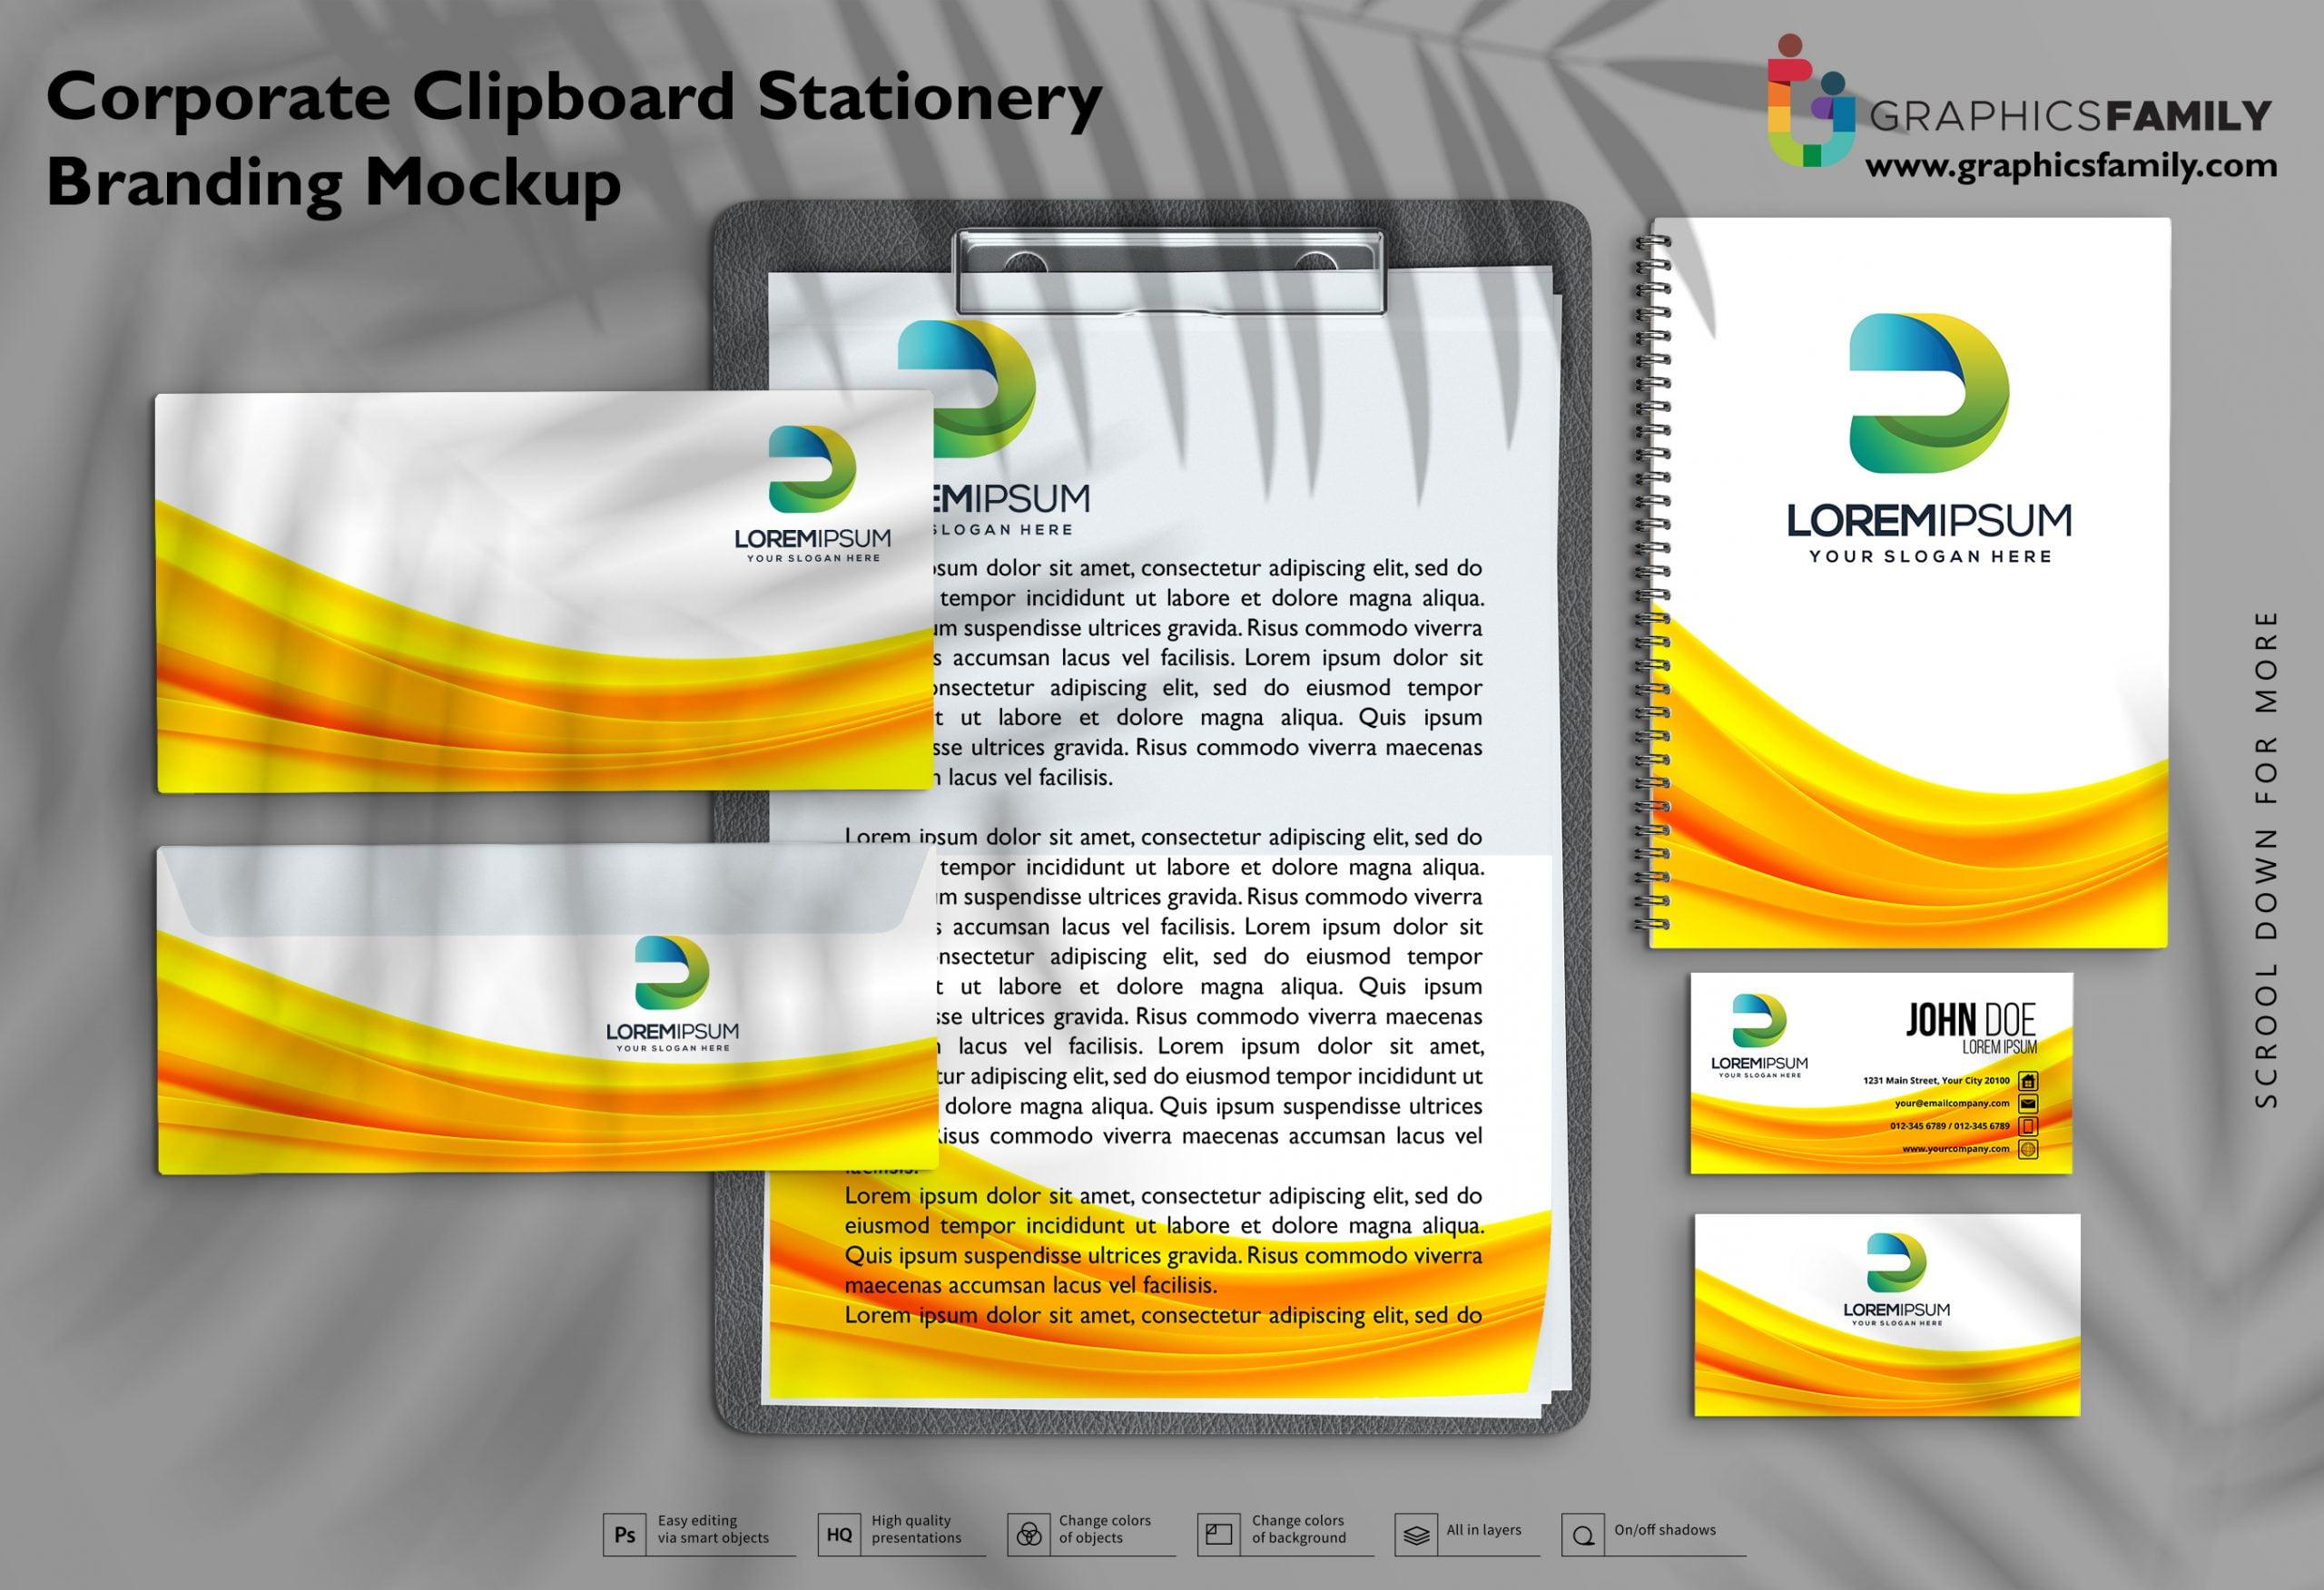 Free Corporate Clipboard Stationery Branding Mockup